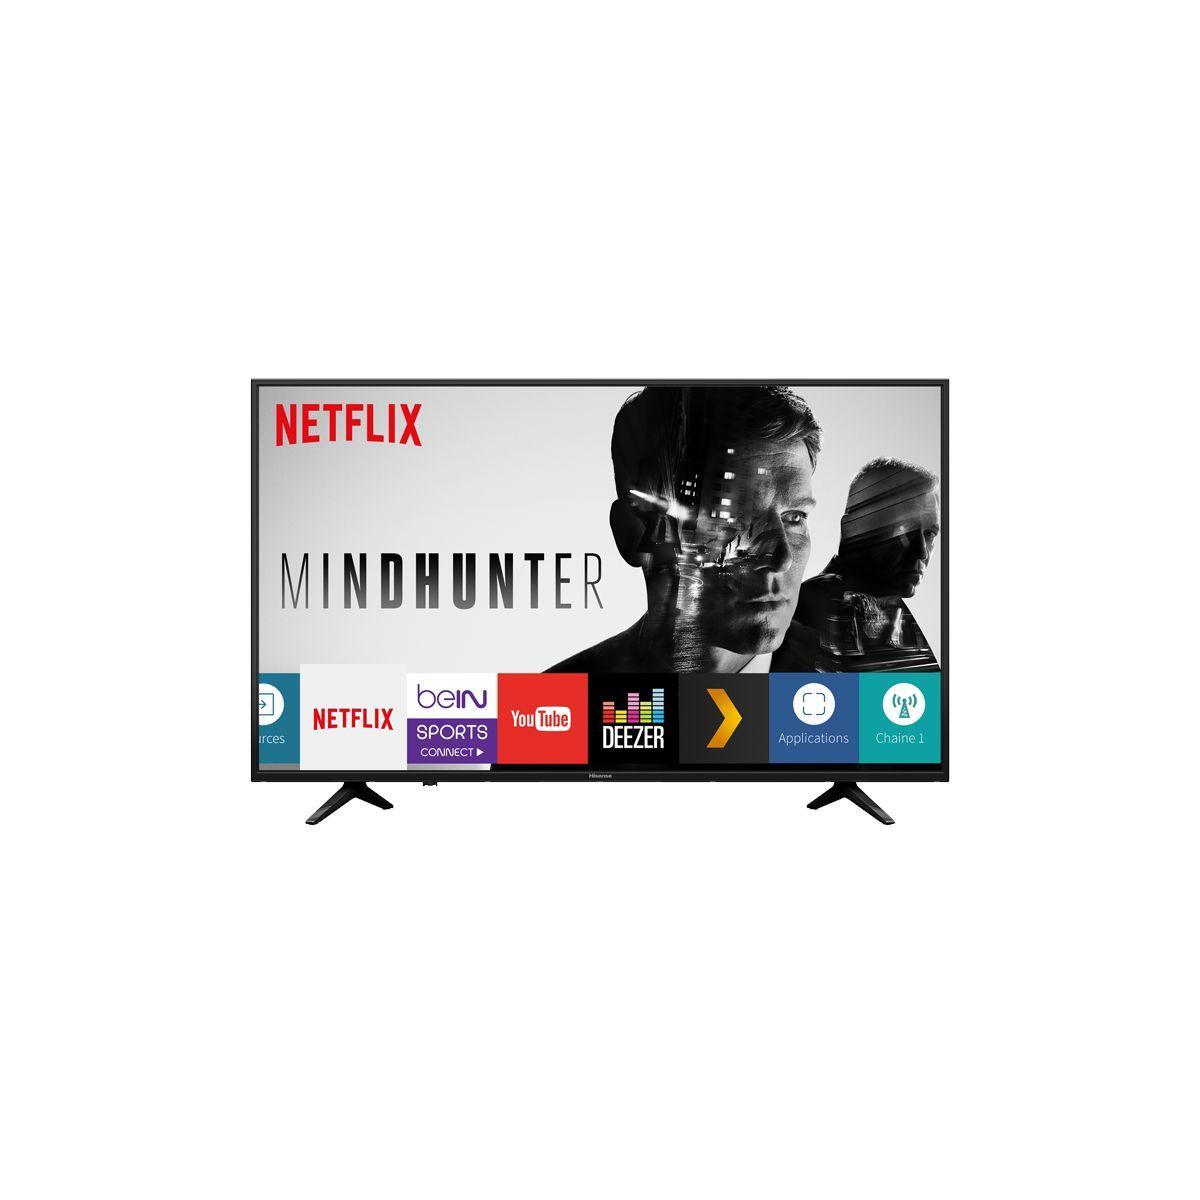 Tv led hisense 43ae6030 - livraison offerte : code premium